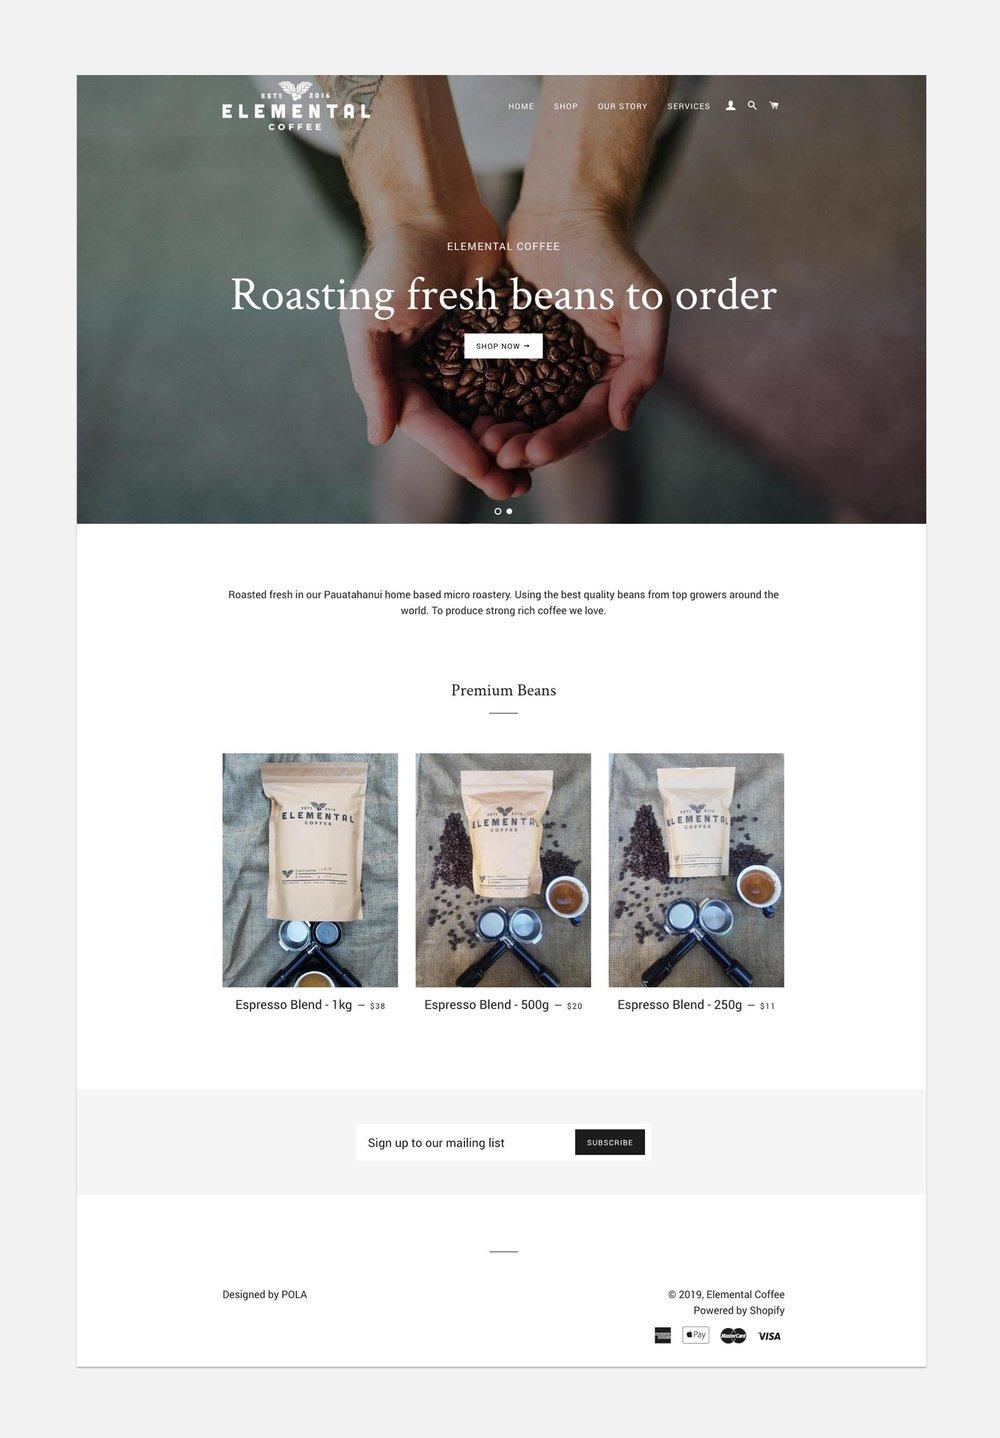 Elemental Coffee | Home page desktop view